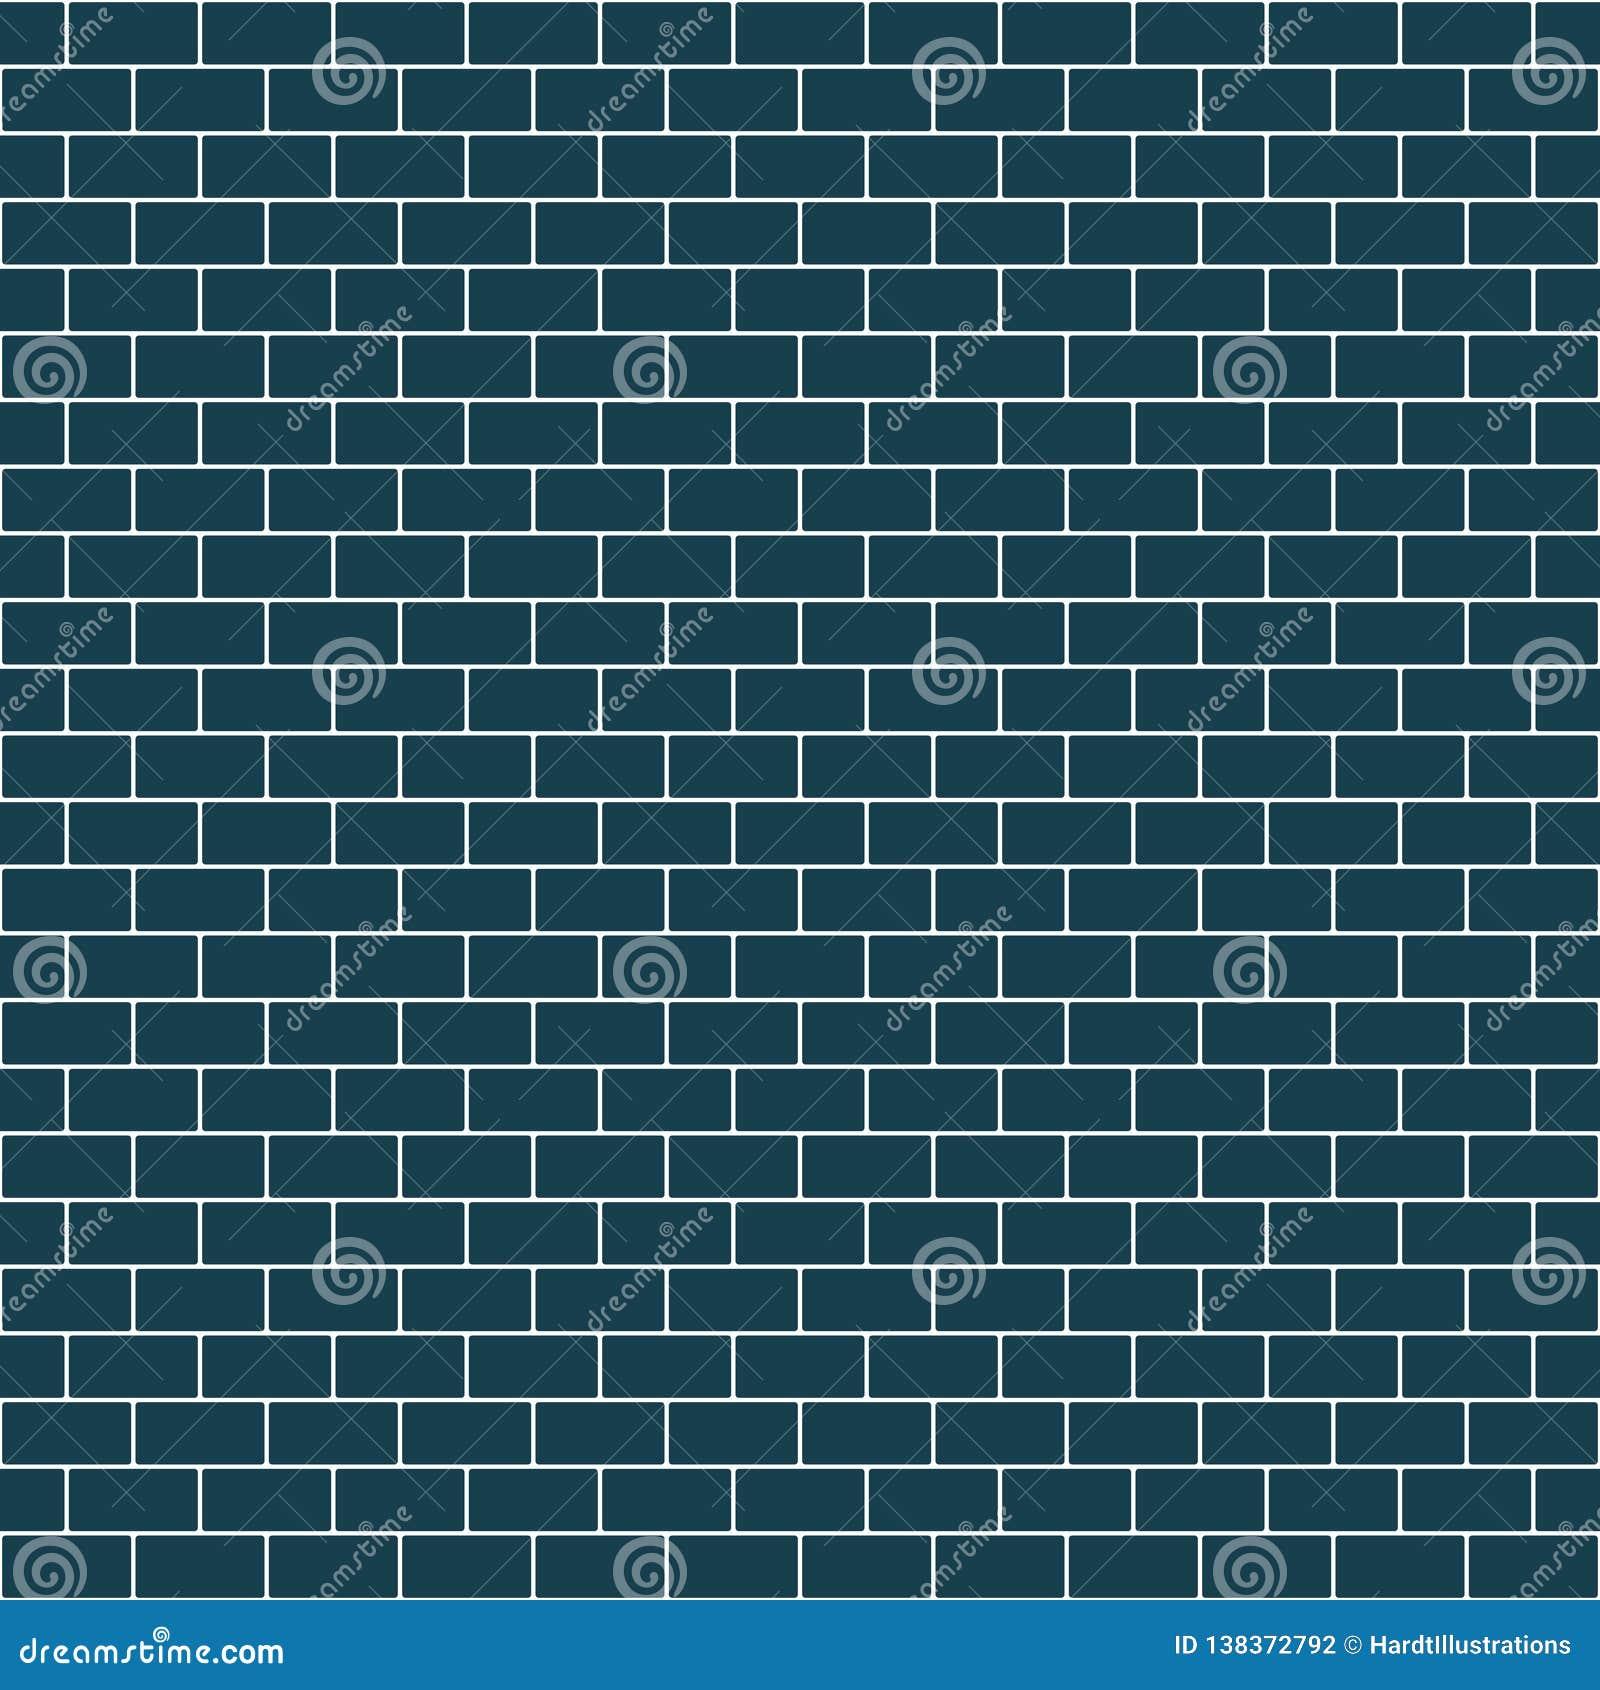 Subway Tile Seamless Pattern Stock Vector Illustration